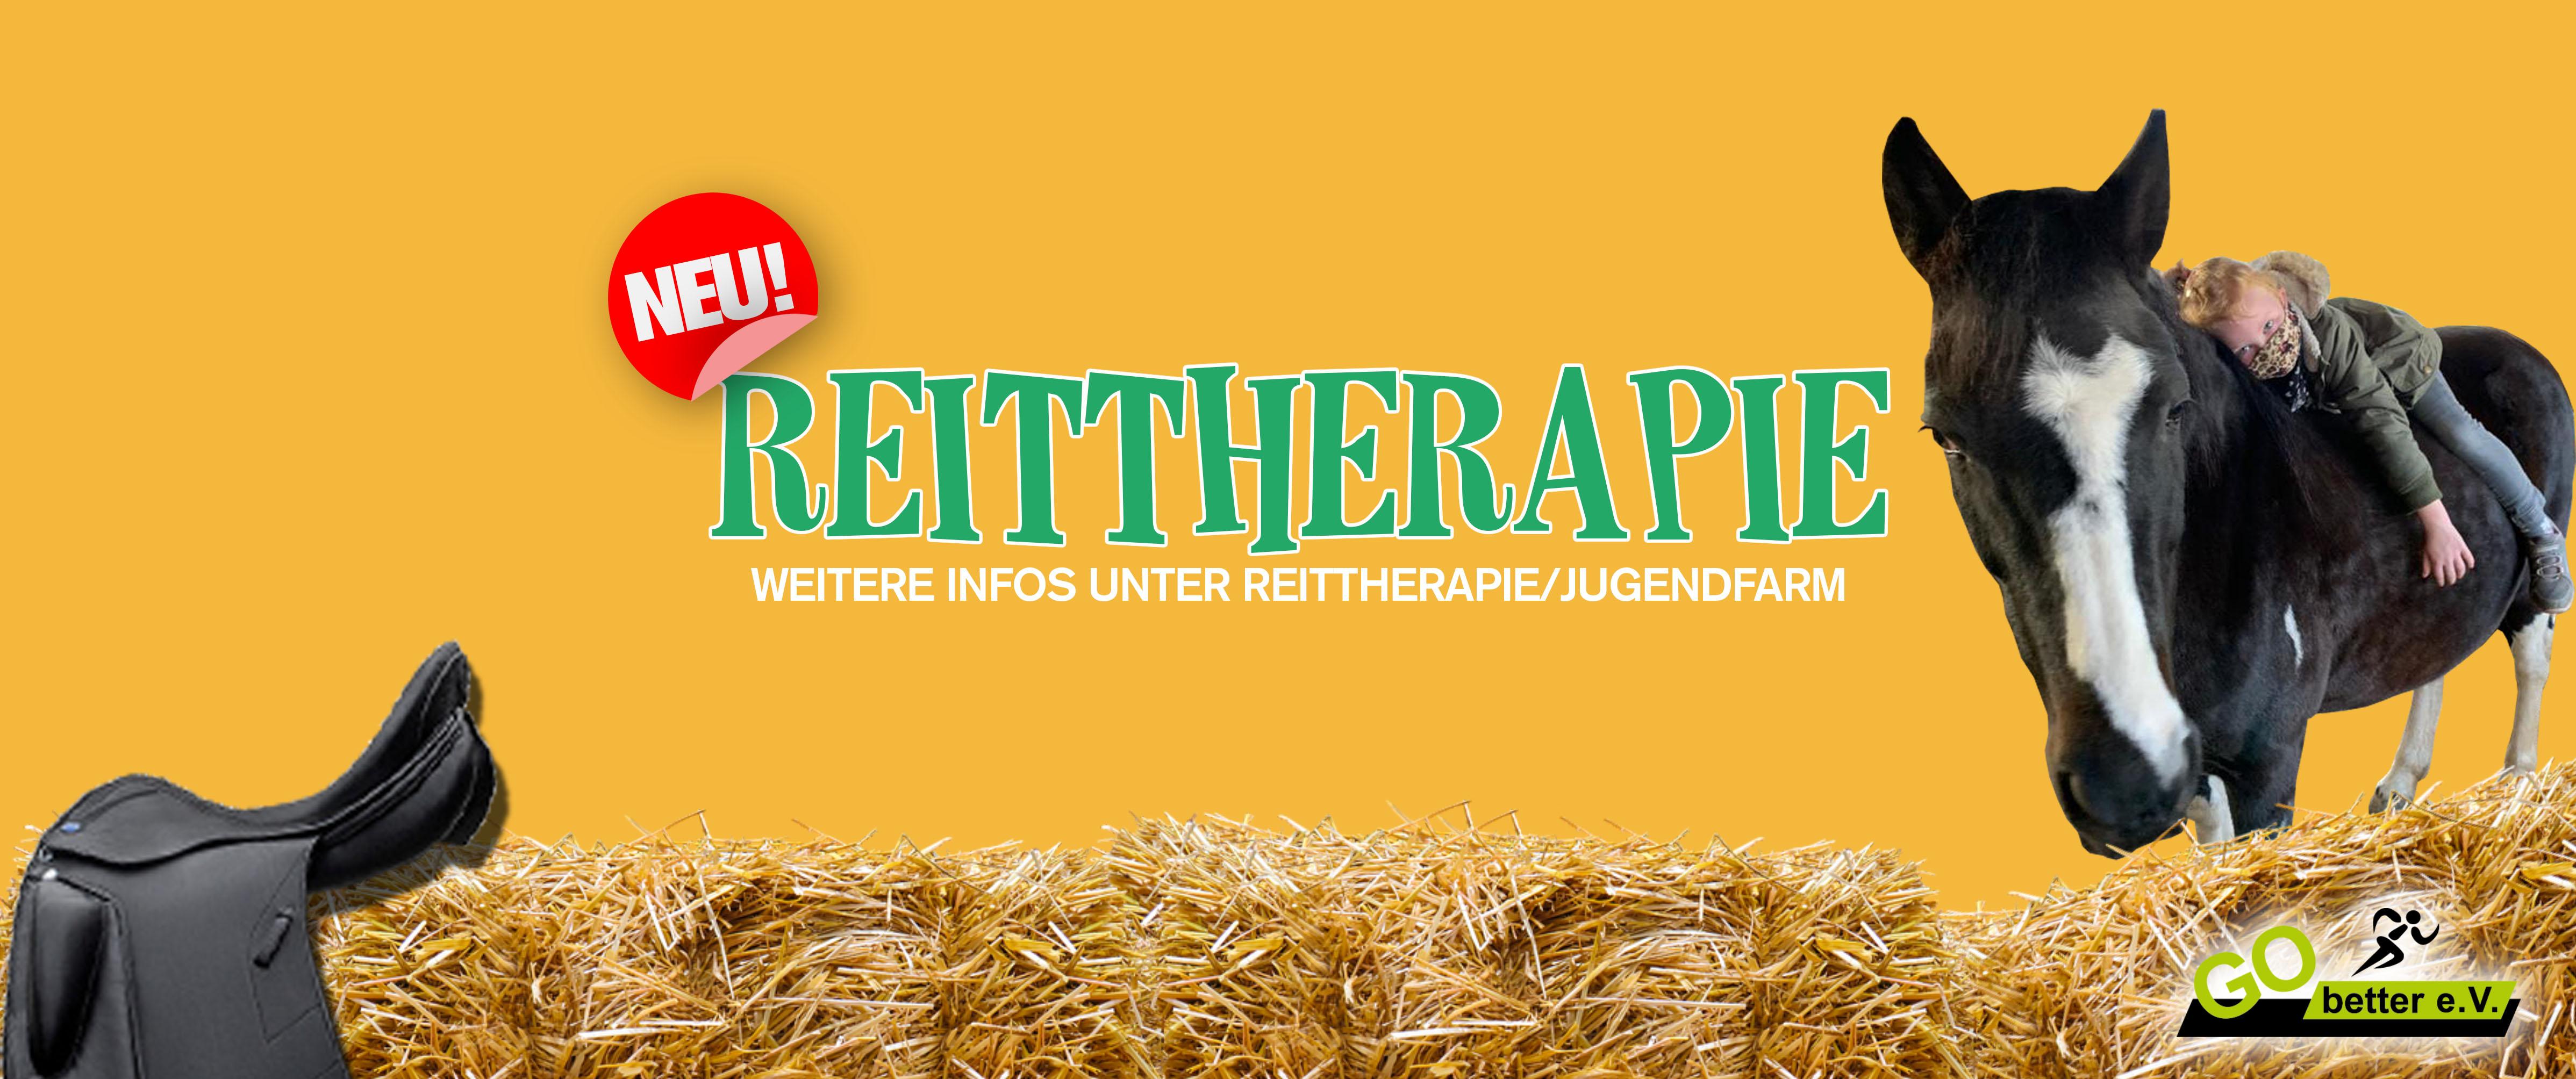 reittherapie.jpg